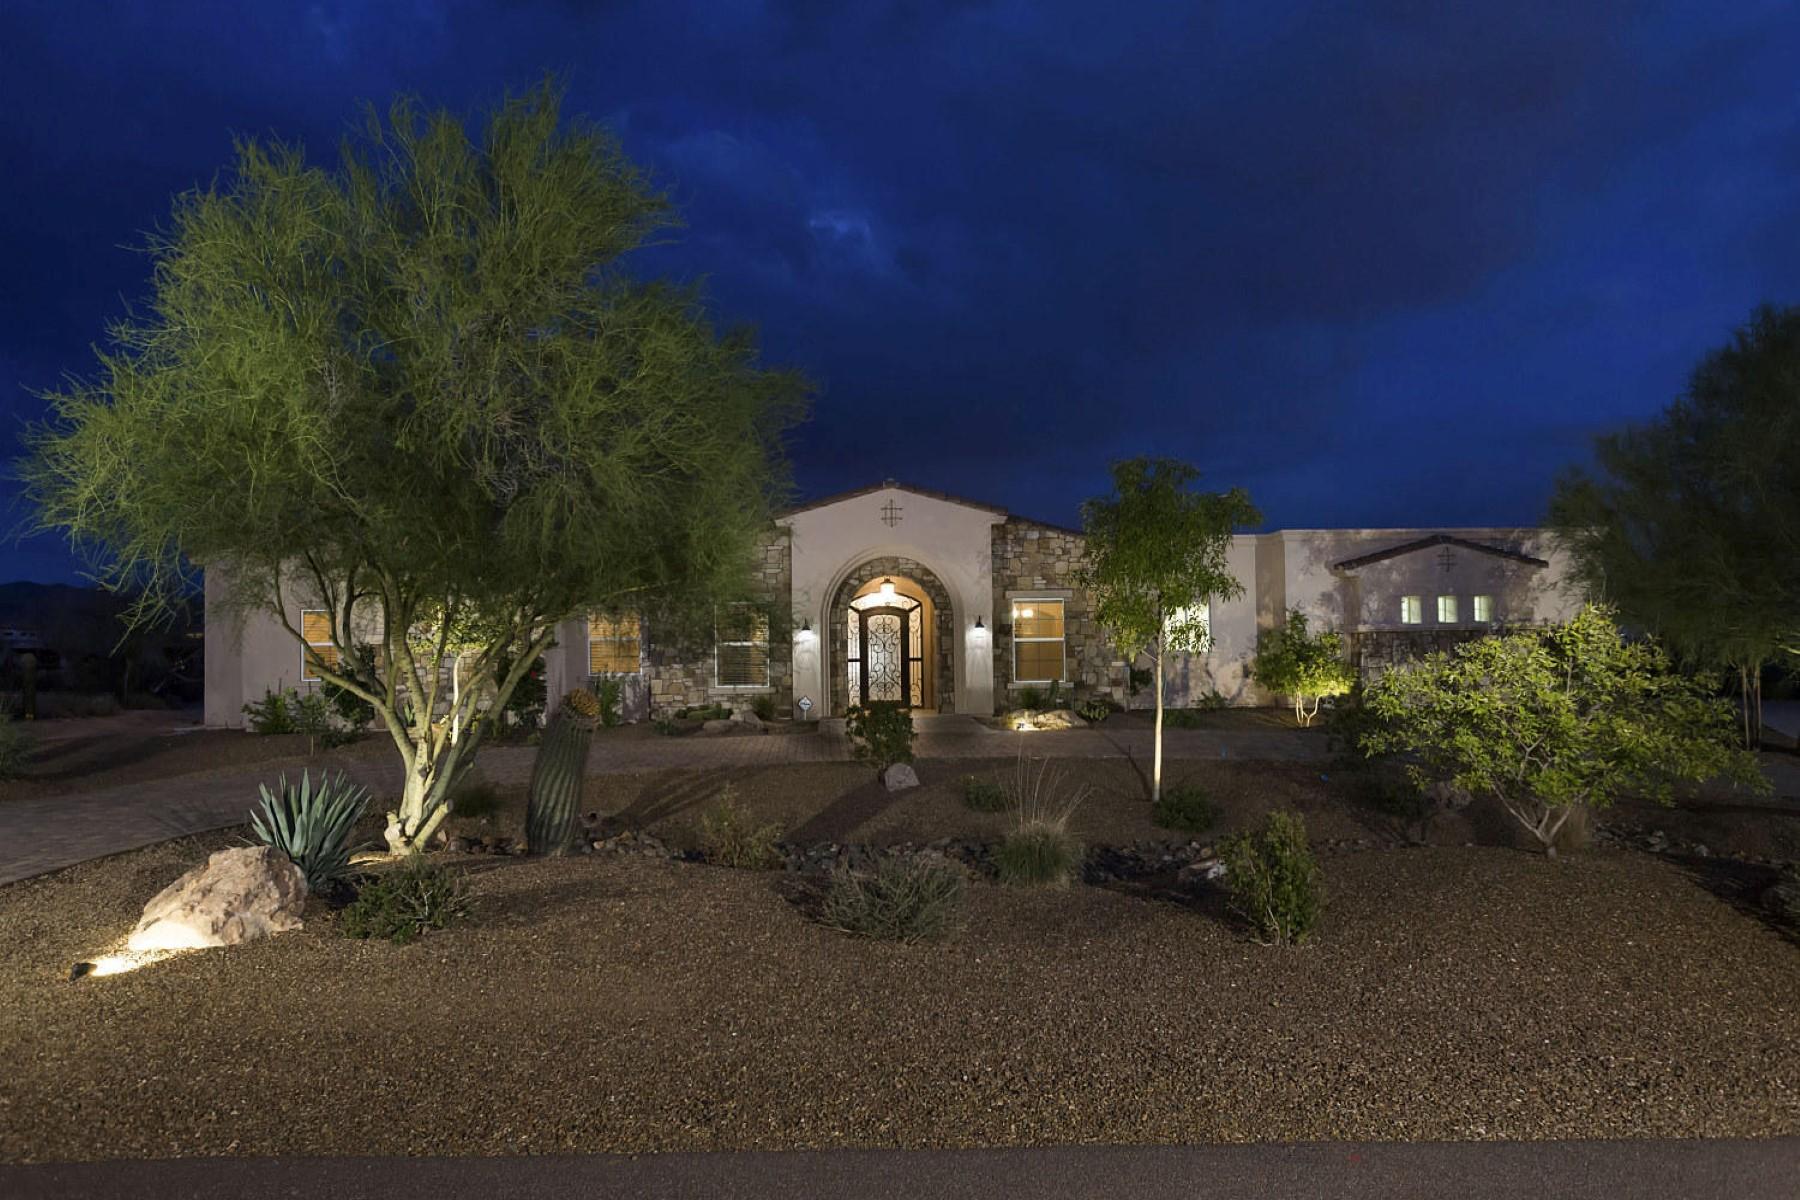 Casa Unifamiliar por un Venta en Gorgeous almost new custom on 1.03 acres offering privacy and mountain views. 8015 E WILLIAMS DR Scottsdale, Arizona 85255 Estados Unidos